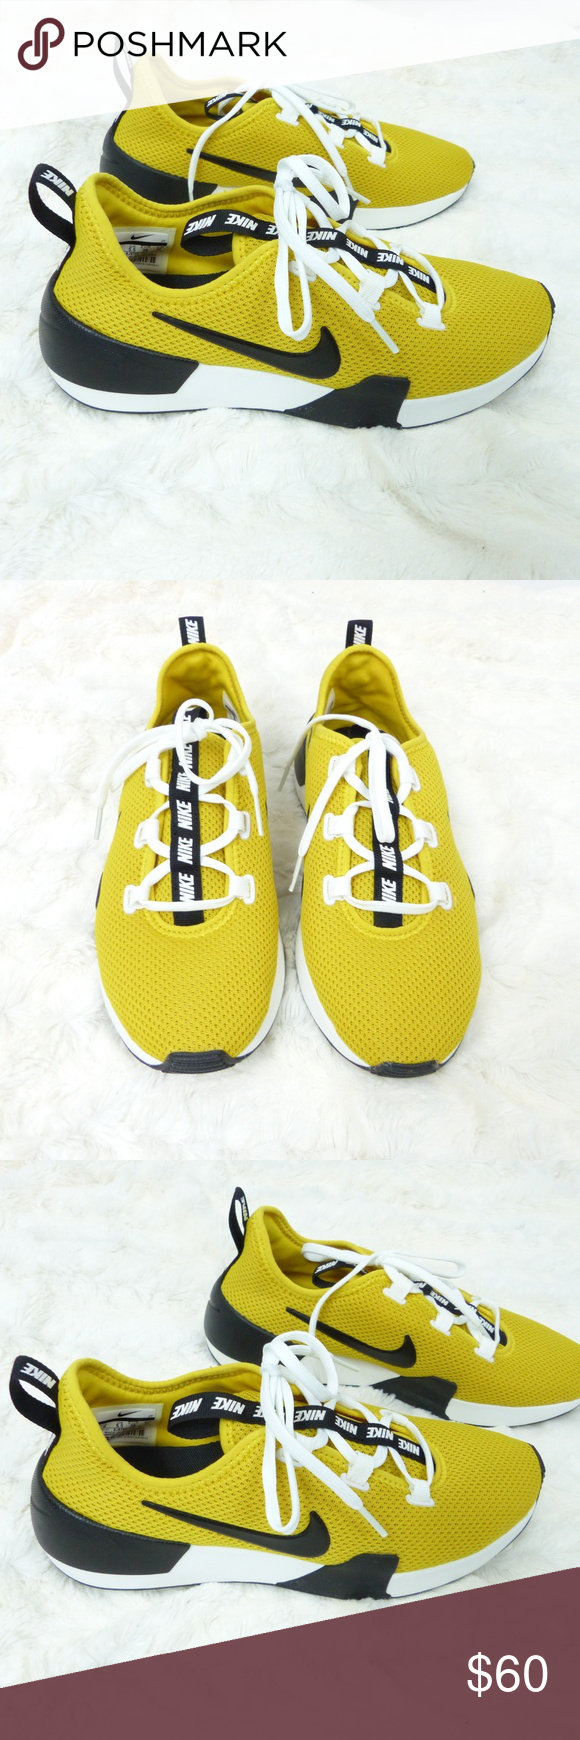 nike ashin modern yellow